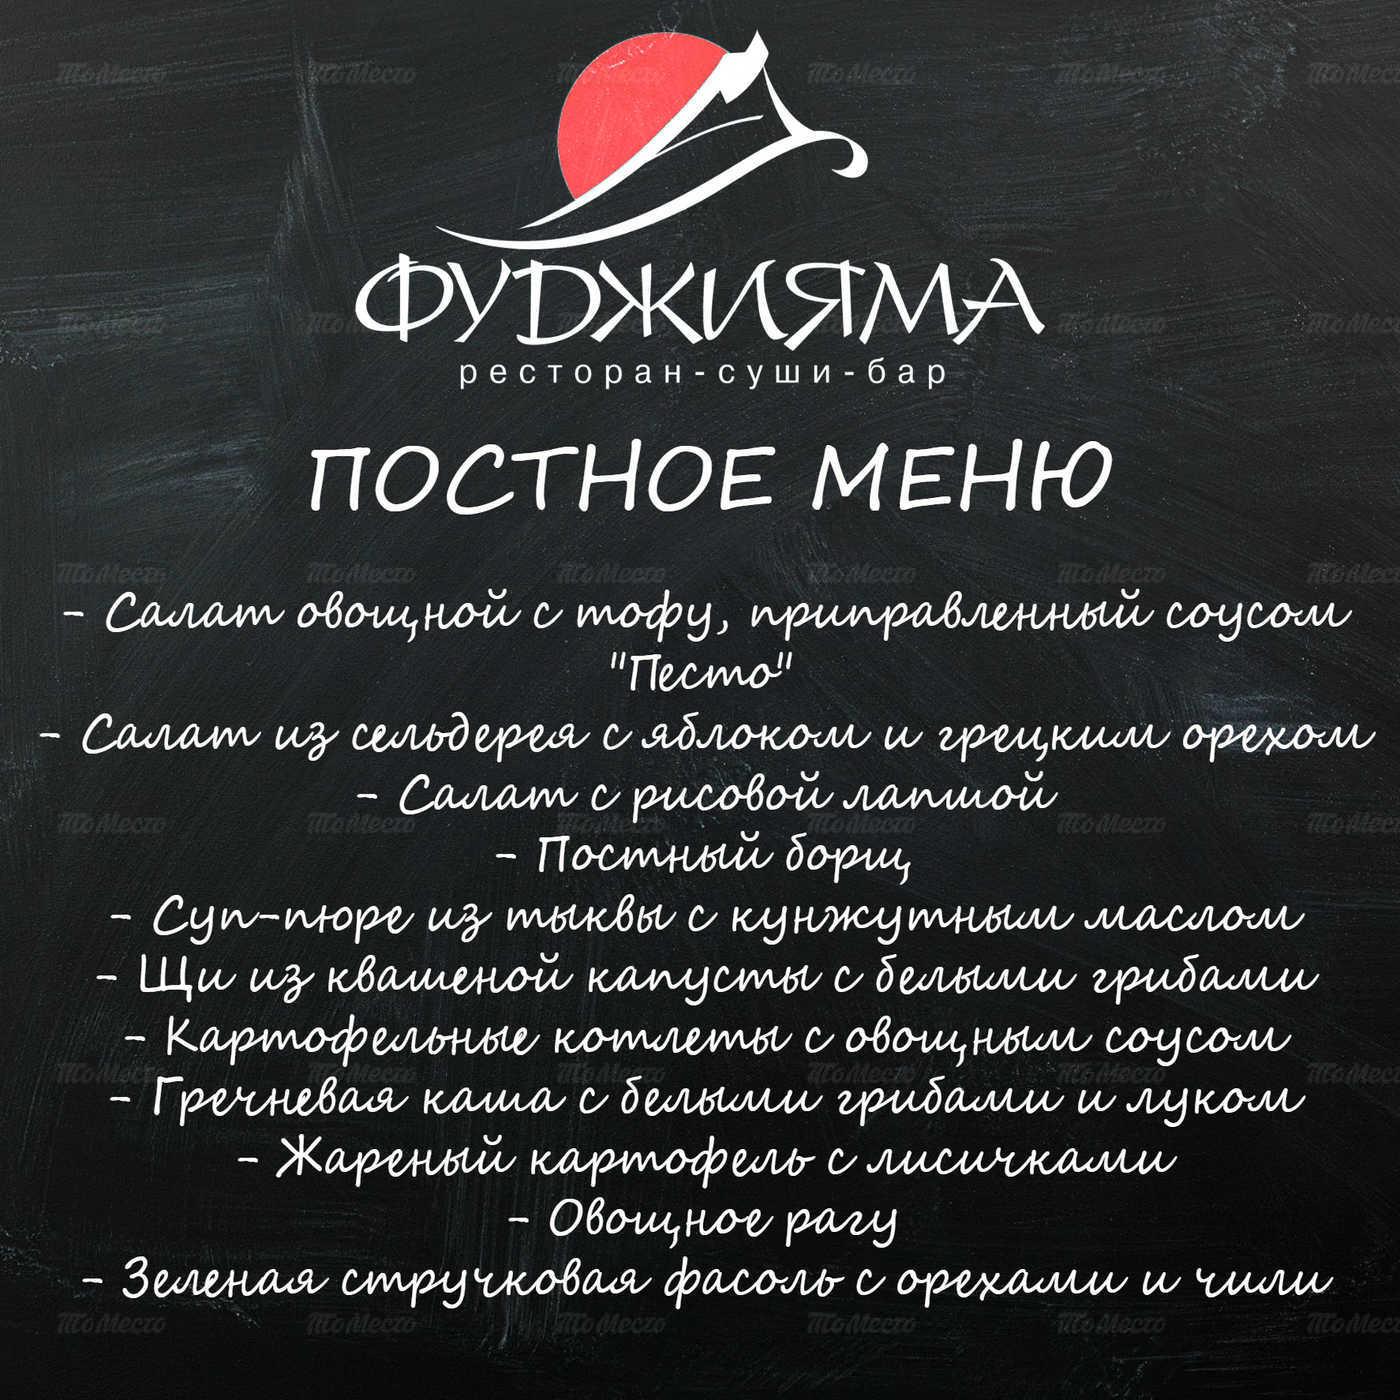 Меню ресторана Фуджияма на Финляндском проспекте